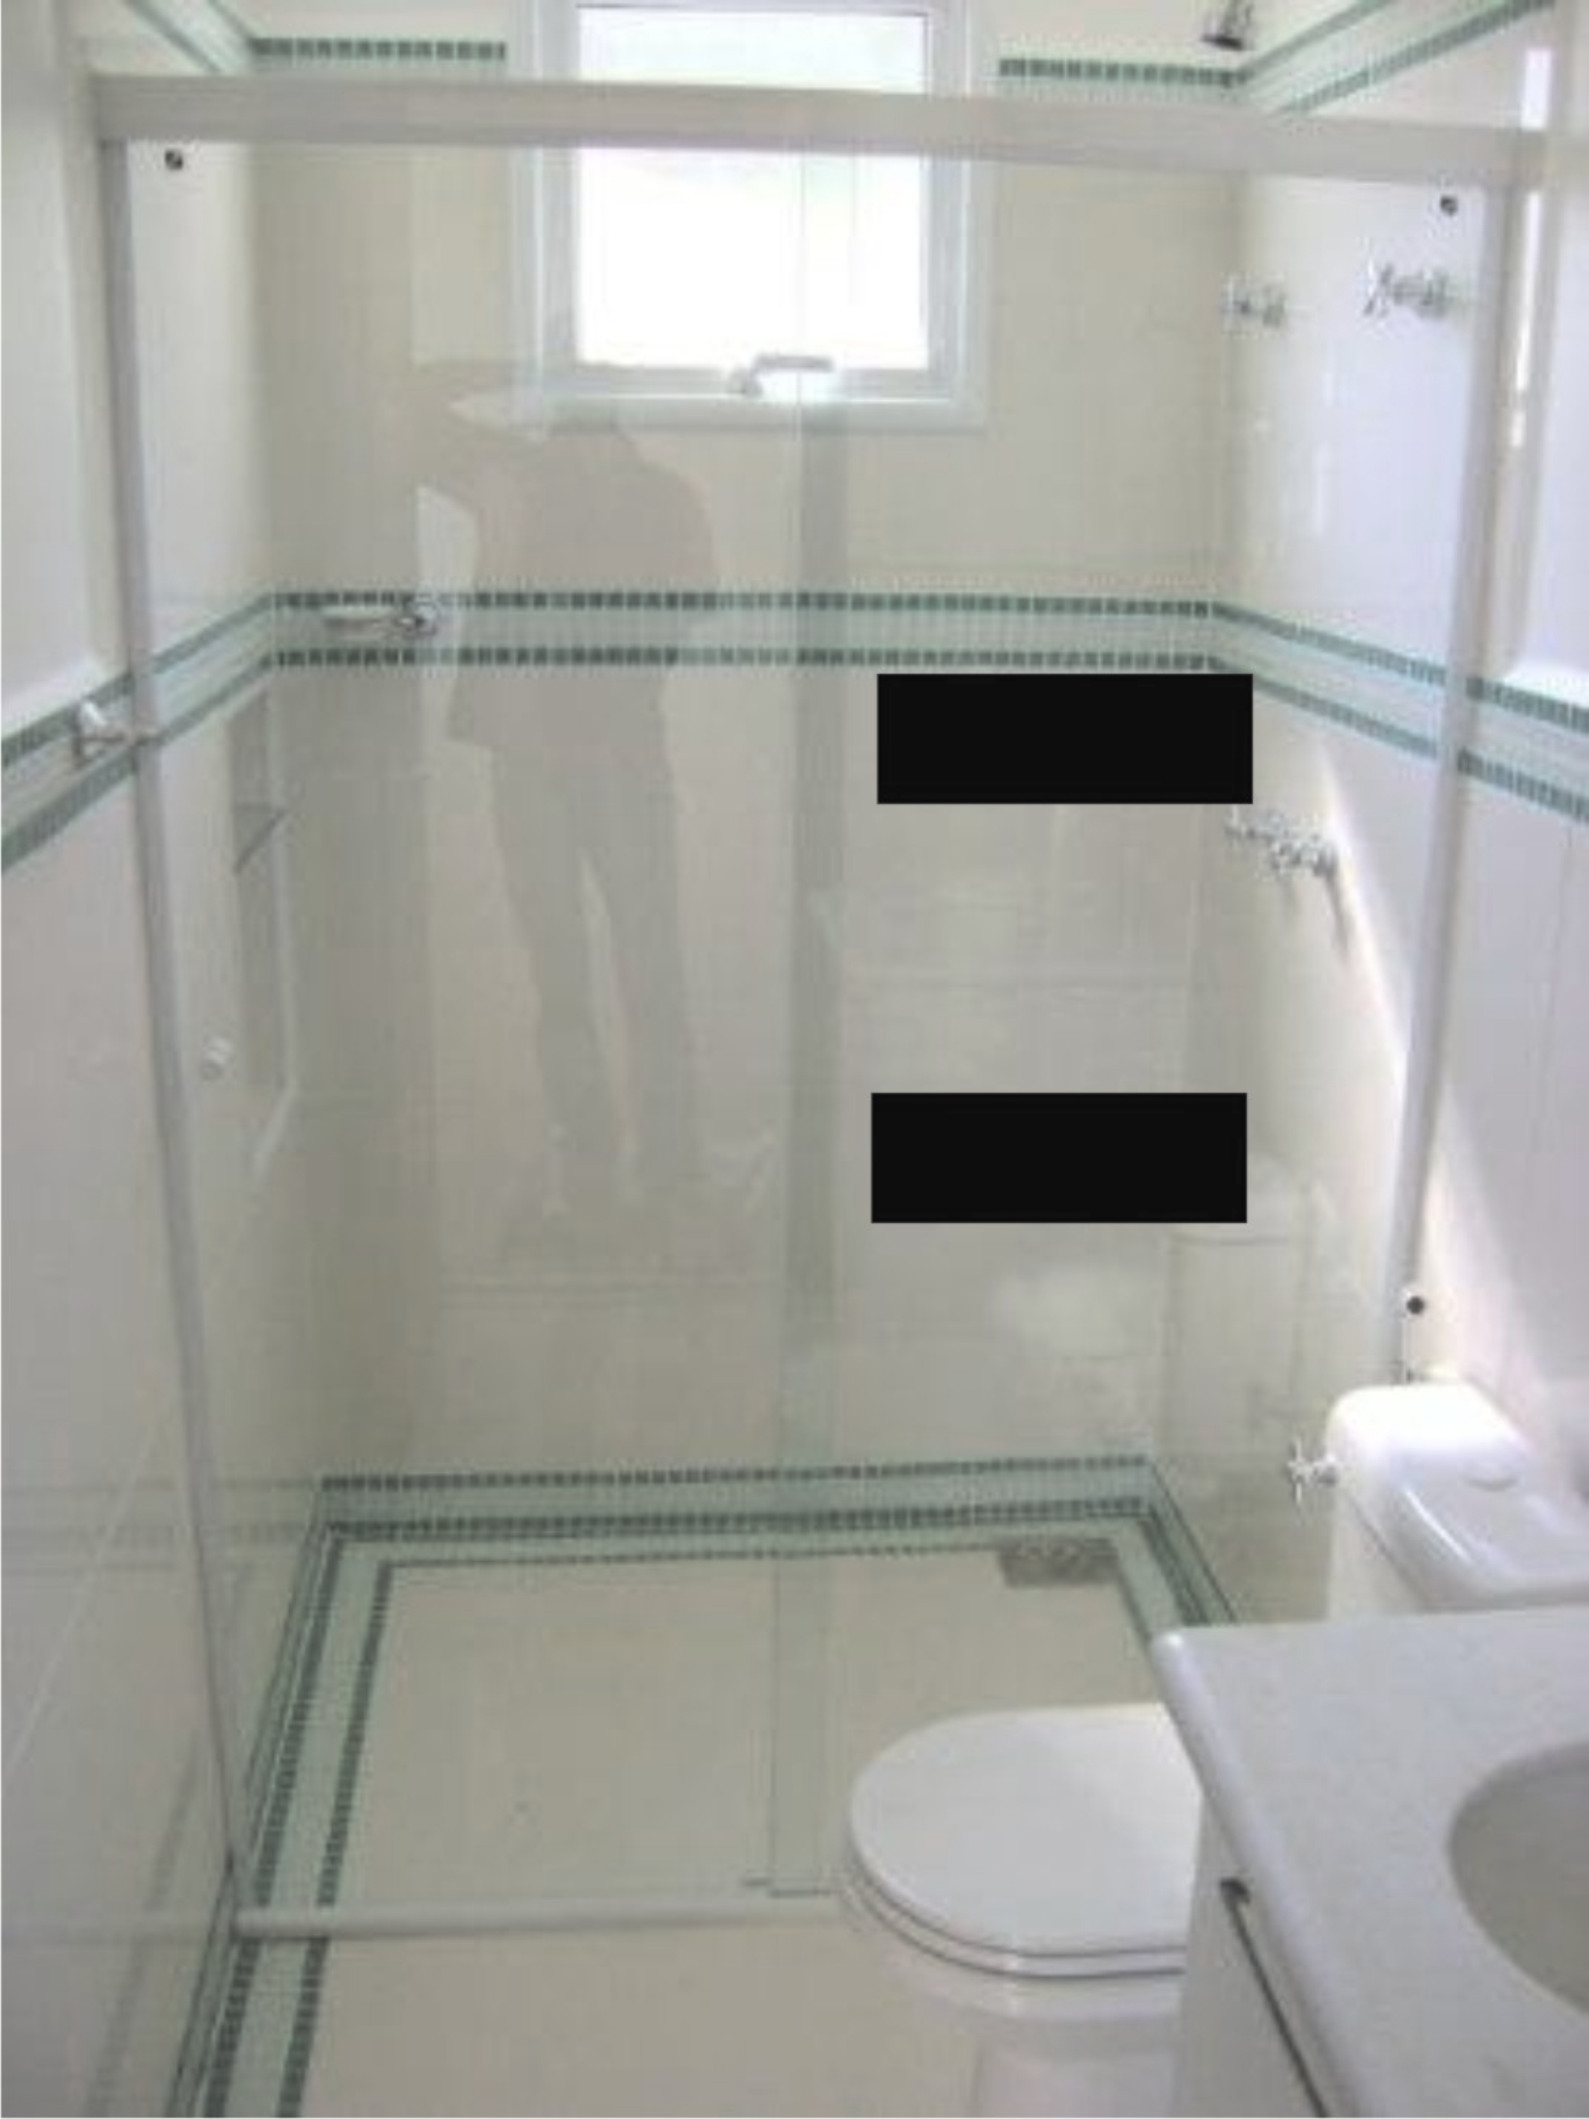 faixa FaixaFotodeStock Imagem:23486430 图片 搜图屋 #6D6B5E 1589x2119 Adesivos Para Box De Vidro Banheiro